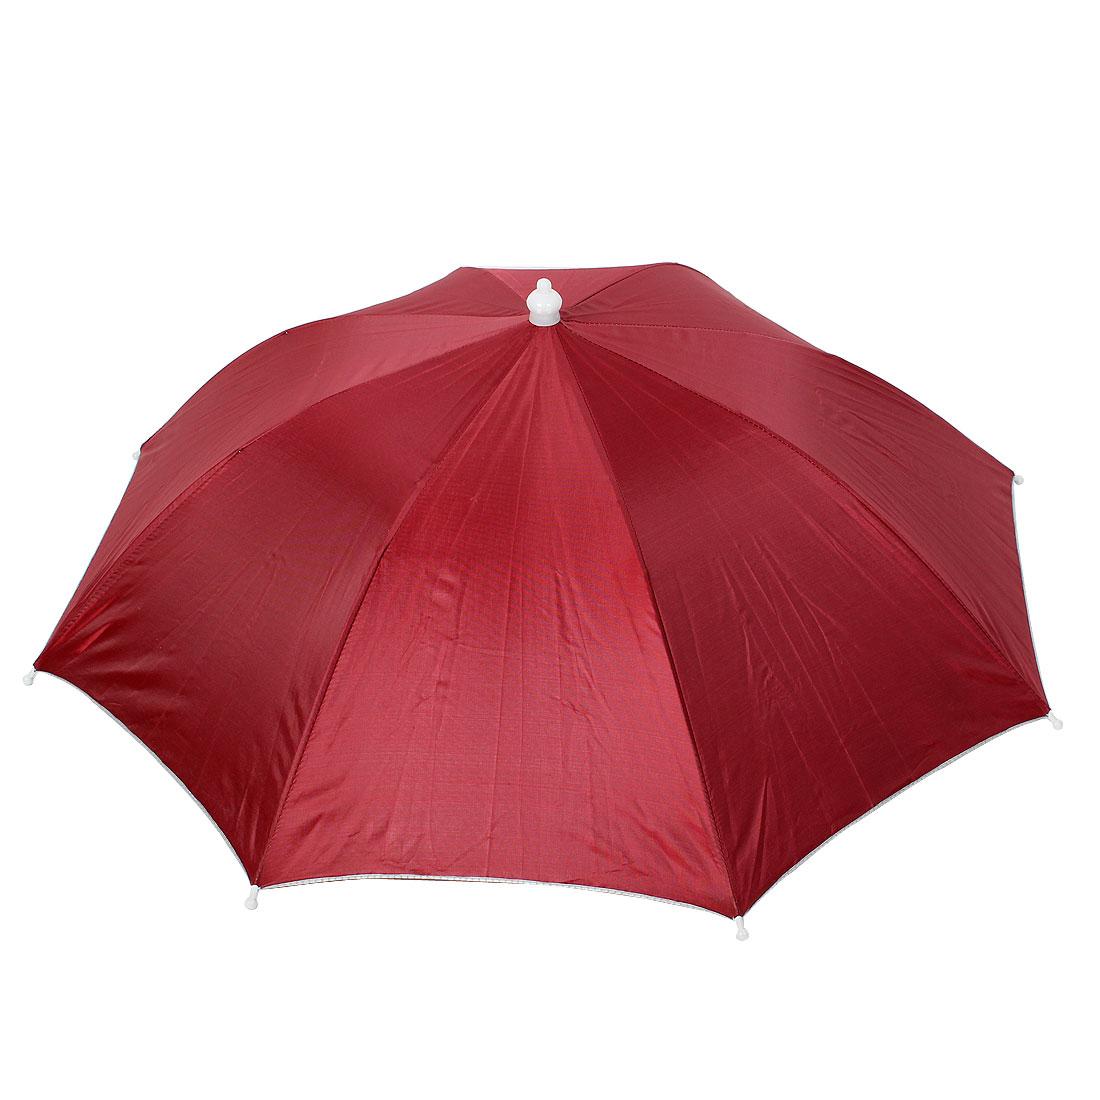 Fishing Travel Headwear Elastic Headband Umbrella Hat Cap Burgundy